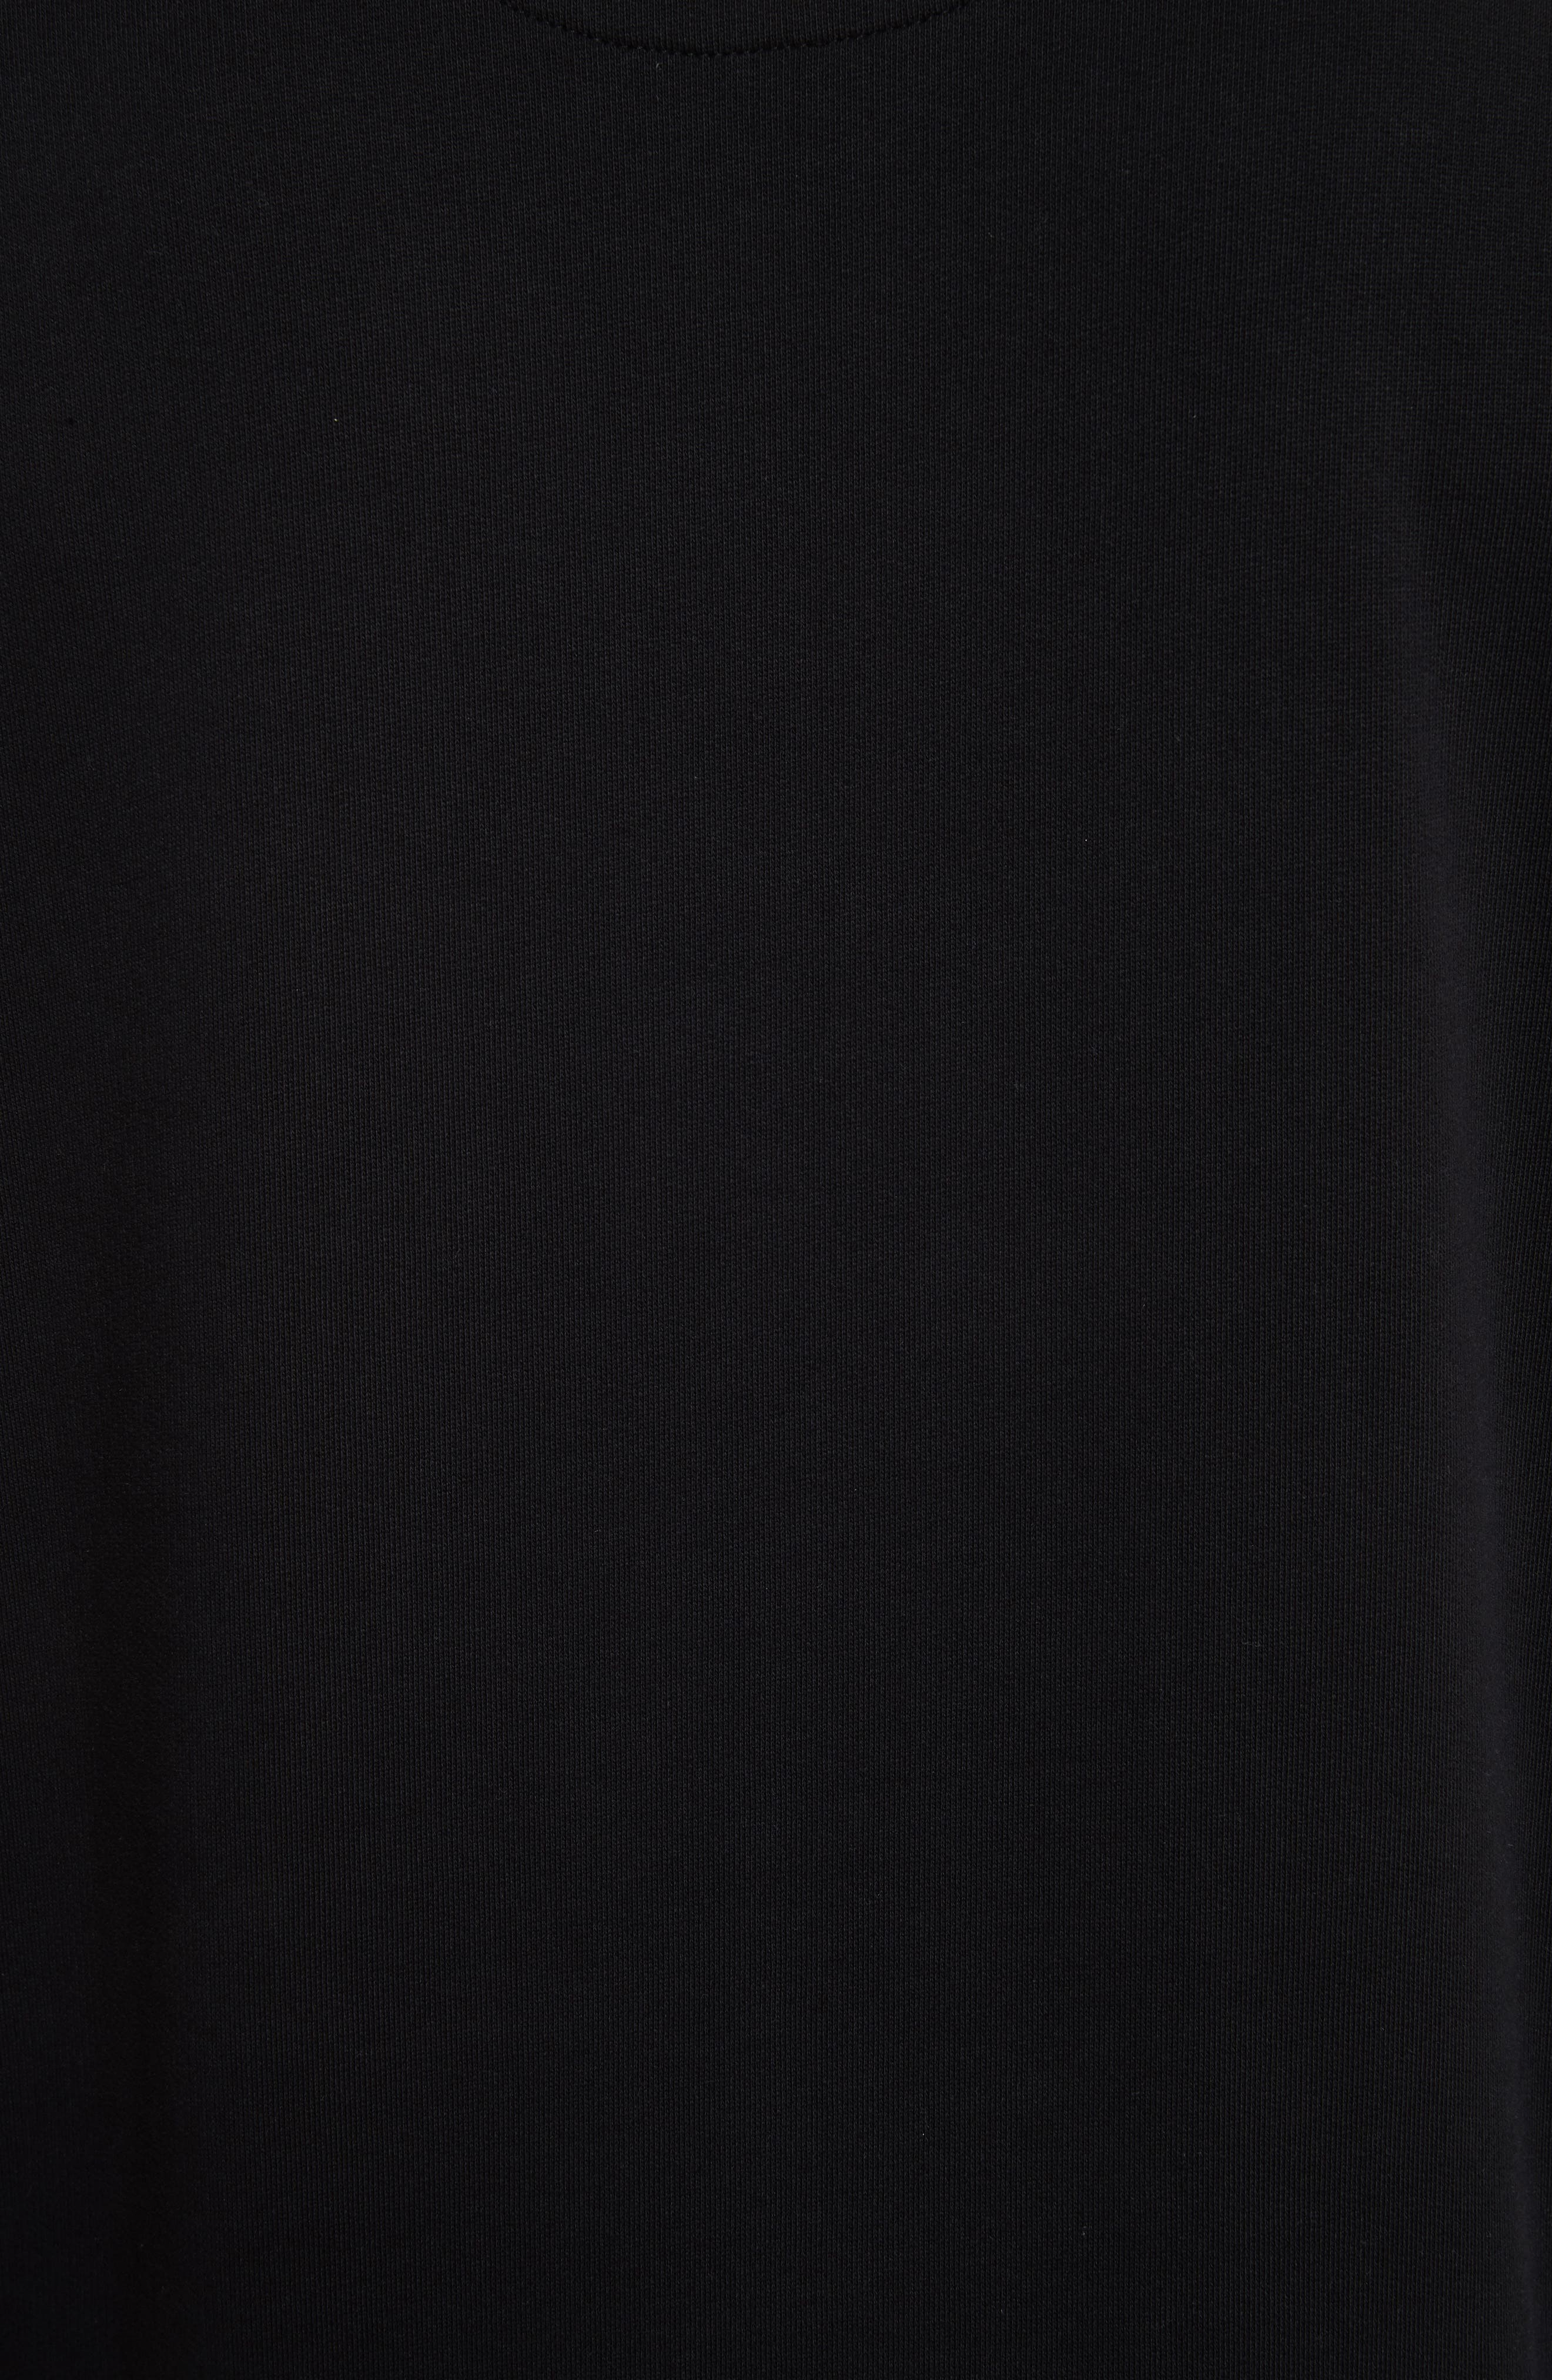 VERSUS by Versace Heartbeat Graphic Sweatshirt,                             Alternate thumbnail 5, color,                             005